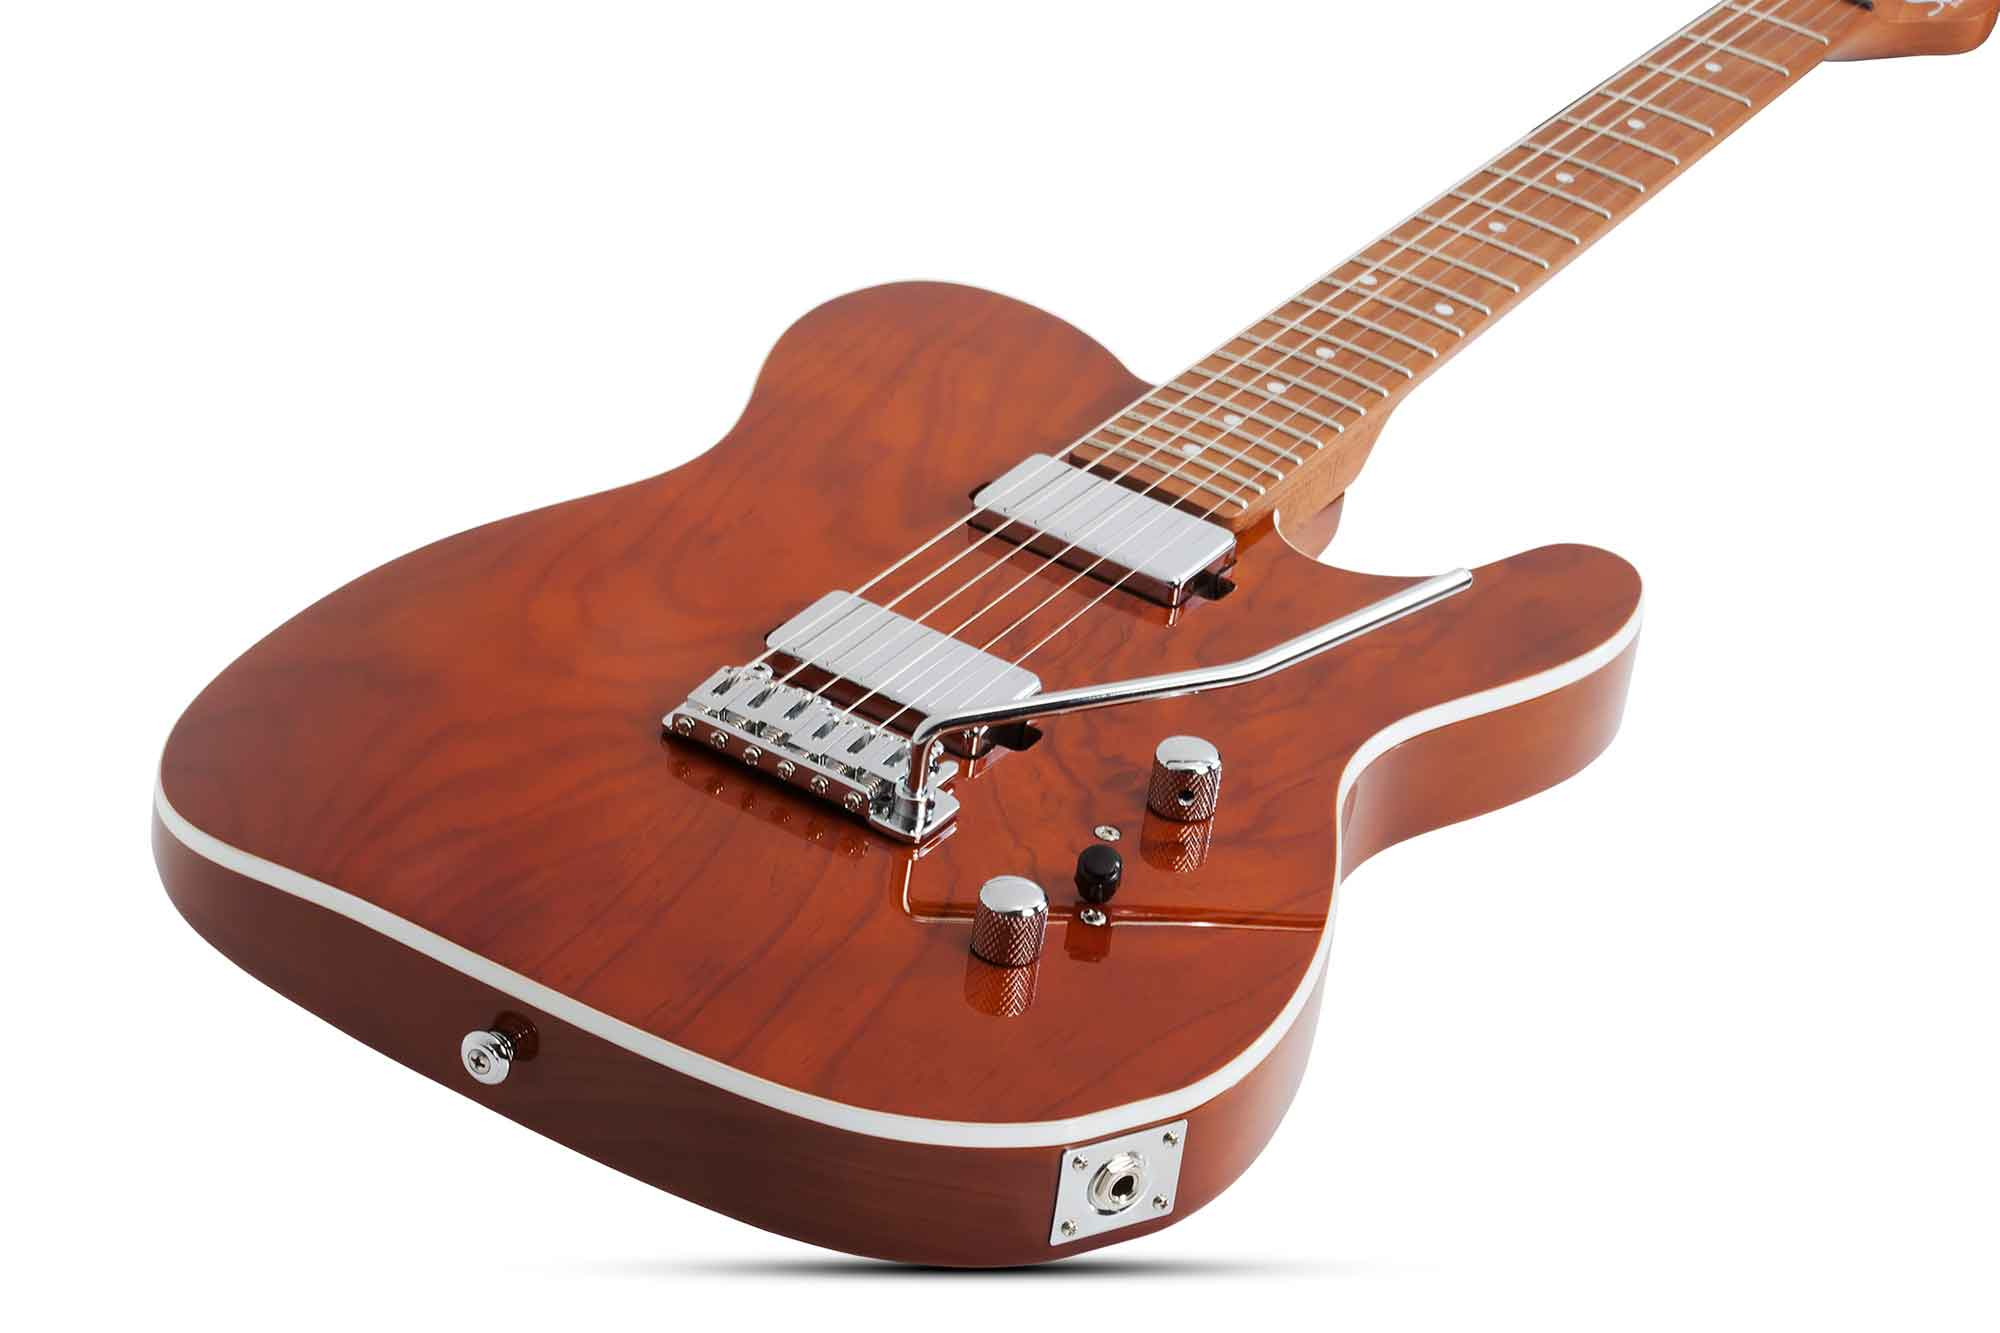 גיטרה חשמלית Schecter PT Van Nuys, Gloss Natural Ash